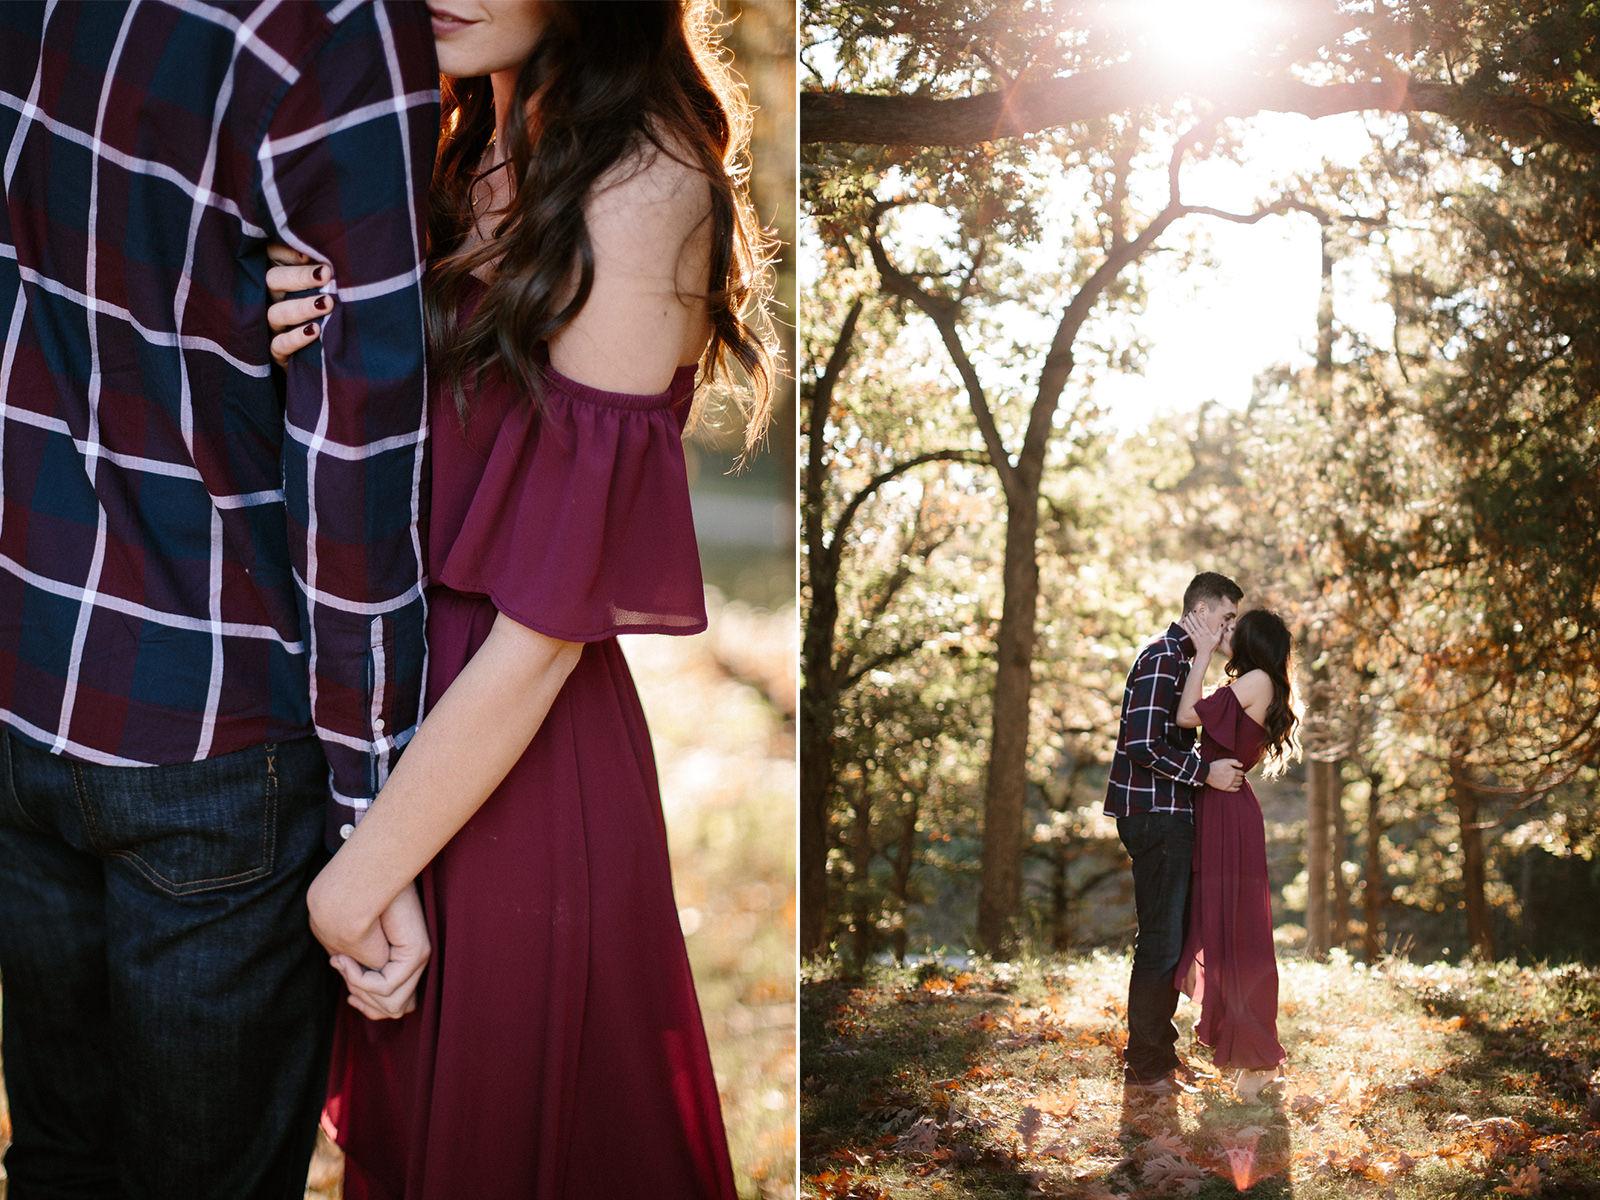 wedding-elopement-adventerous-romantic-timeless-des-moines-siouxfalls-photography-02.jpg